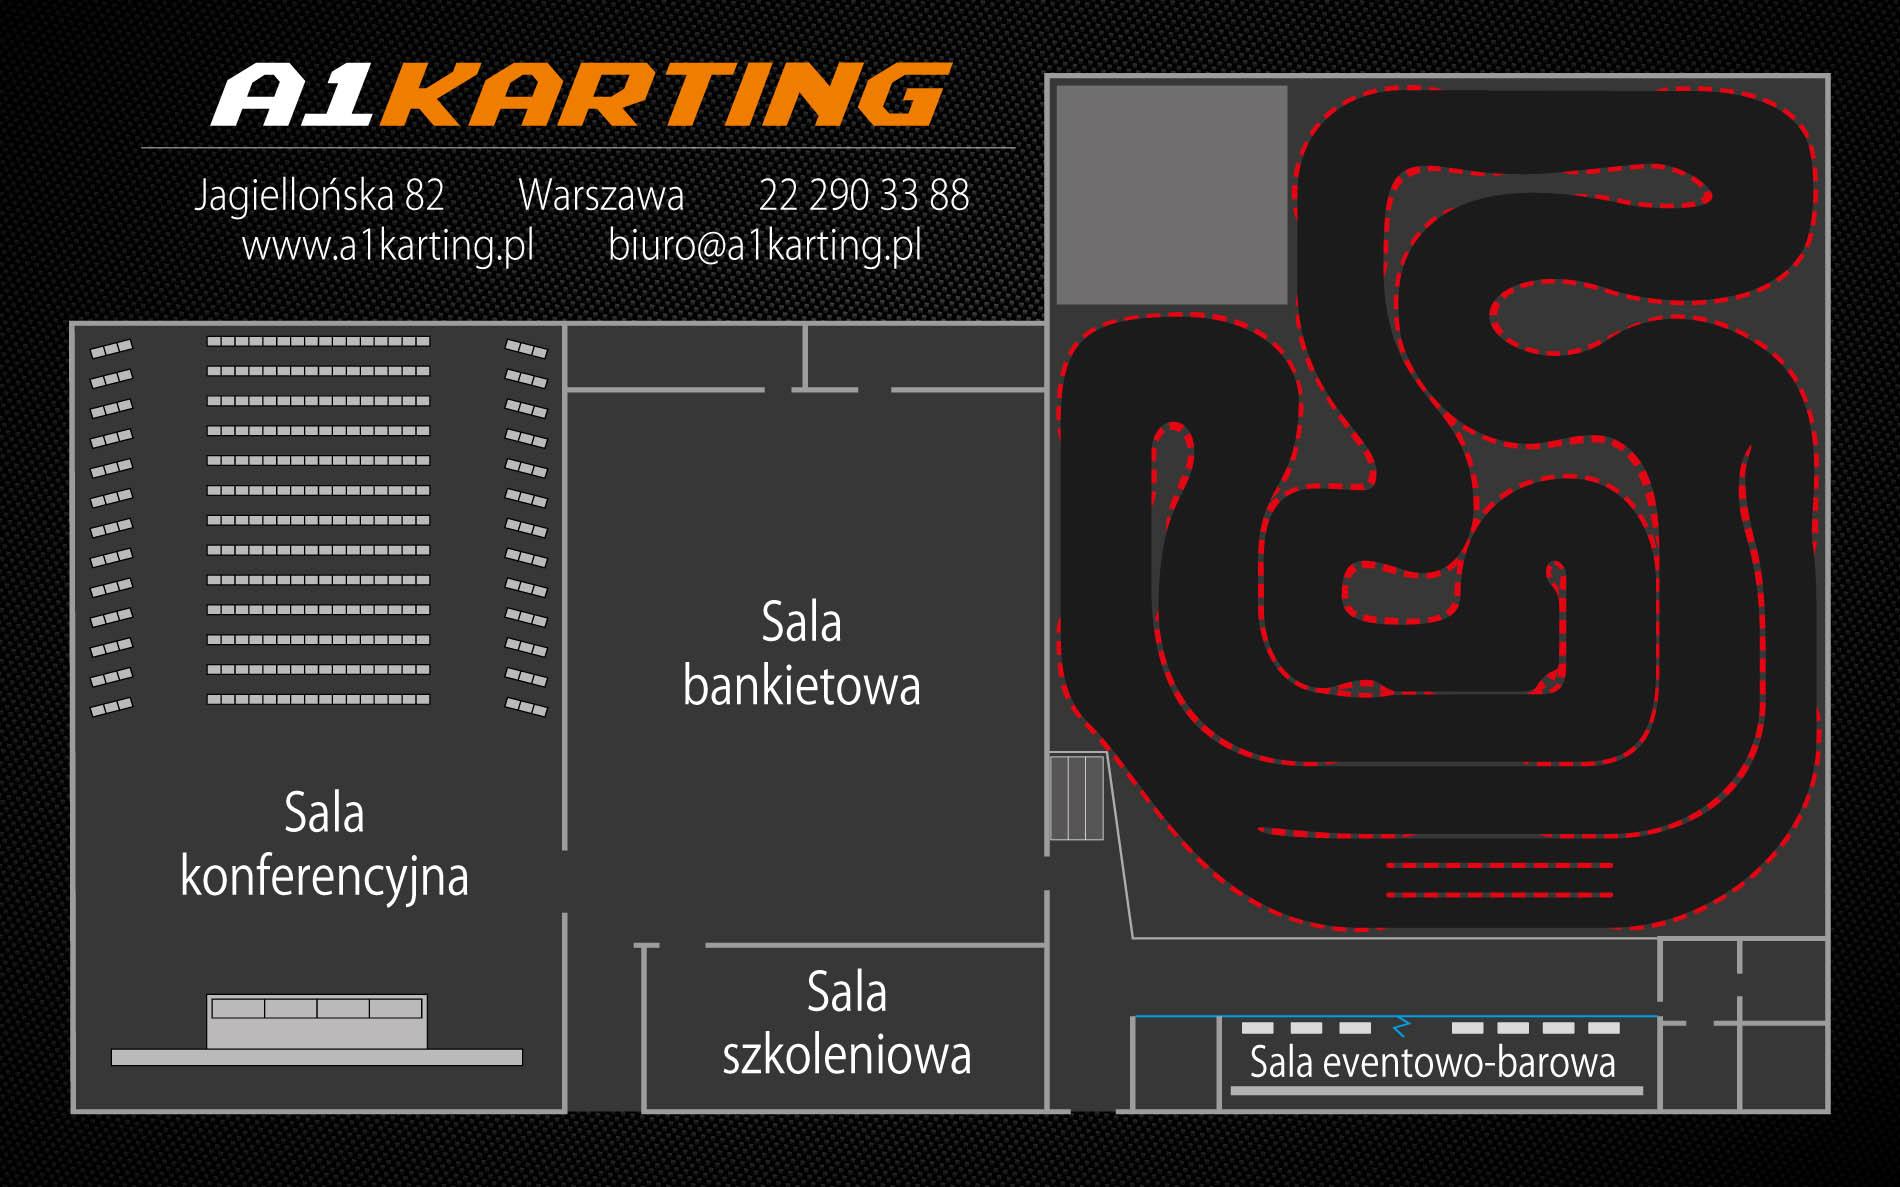 Plan obiektu A1Karting